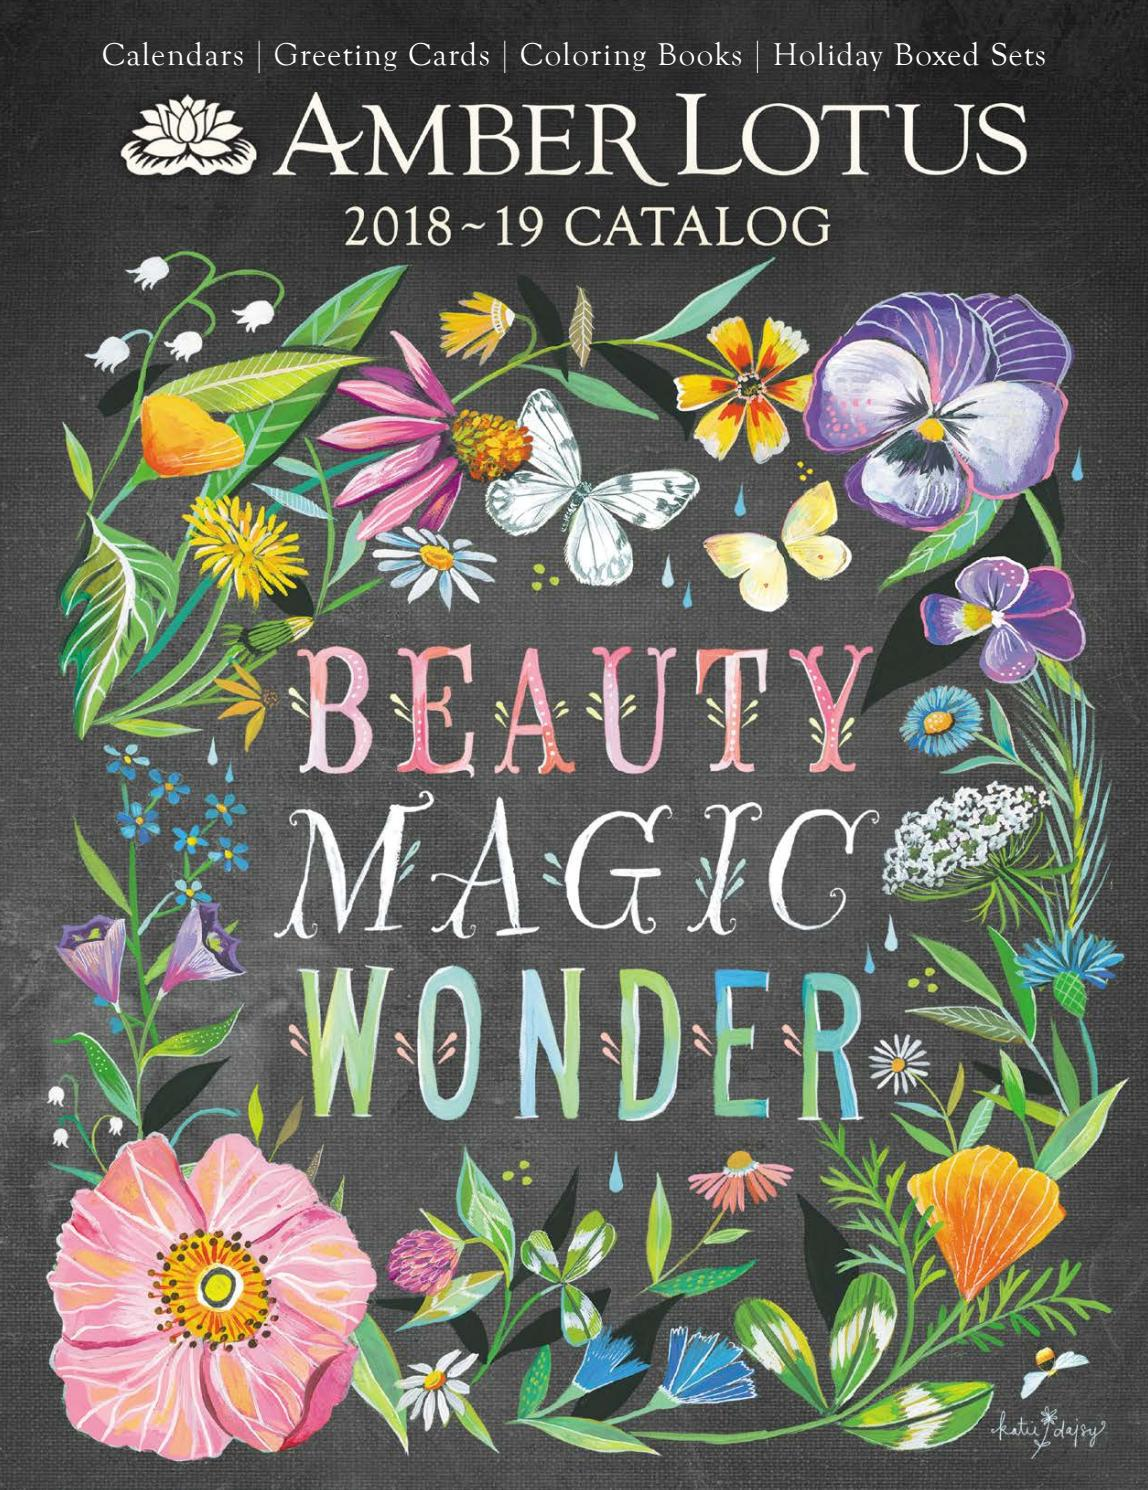 Amber Lotus Publishing 2018 2019 Catalog 2019 Calendars Greeting